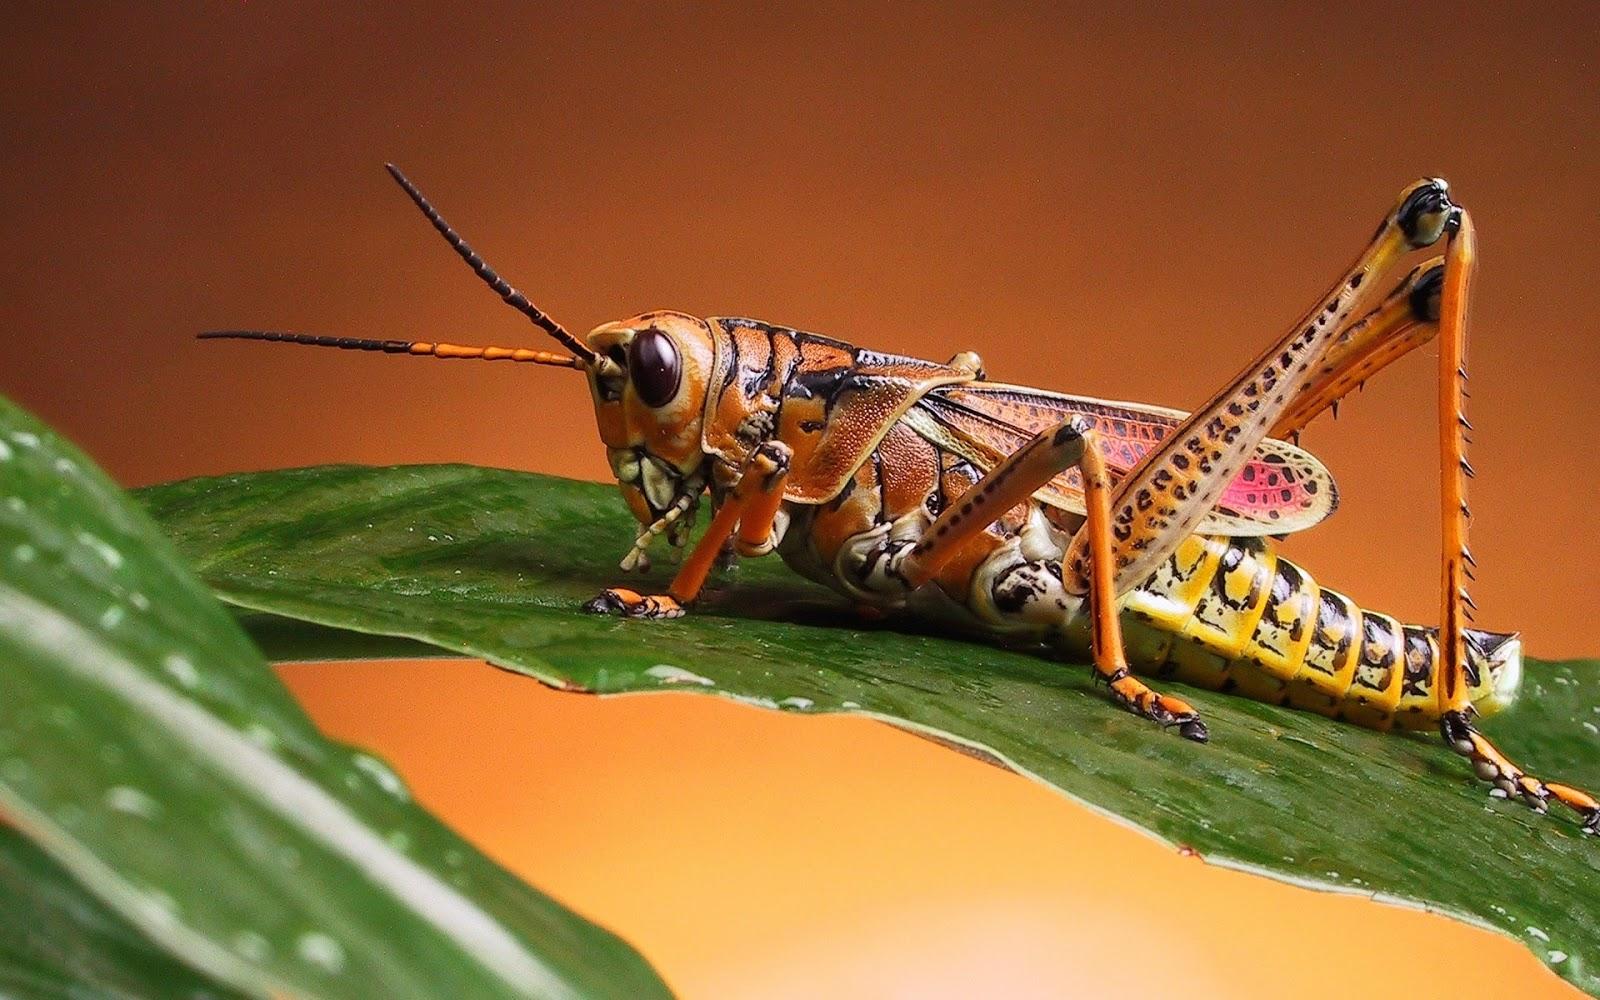 http://1.bp.blogspot.com/-qXDX4hDCLr0/UgqS_NvvANI/AAAAAAAAVMA/JY0yqnegmyA/s1600/cricket-wallpaper-x-.jpg